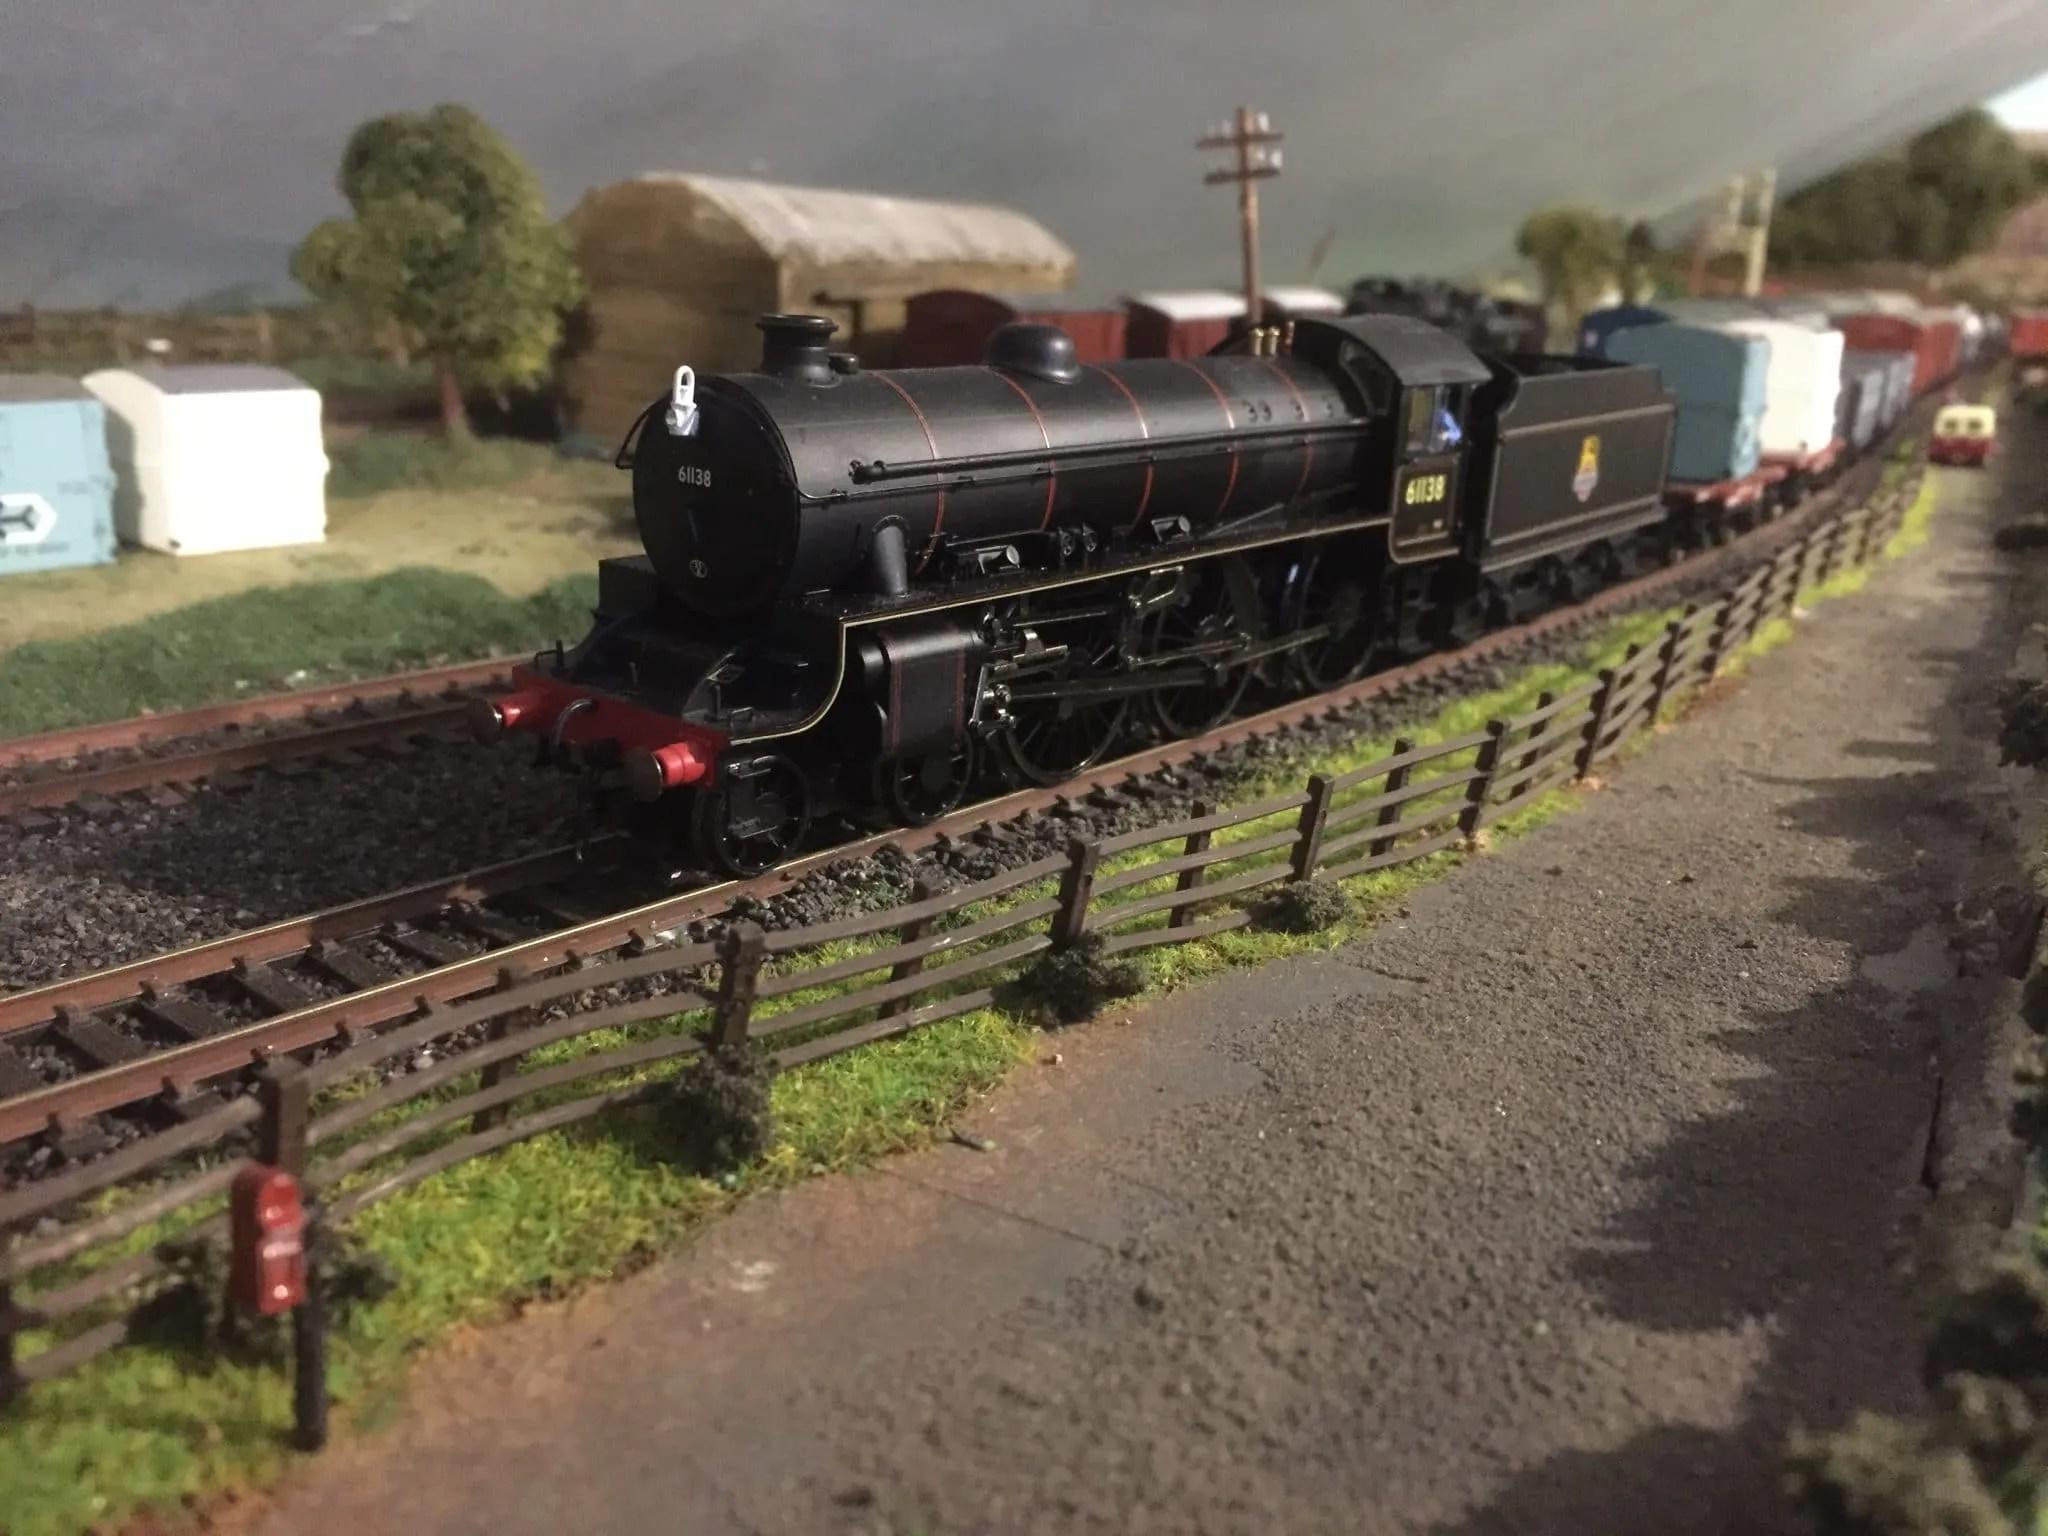 Superb 00 Gauge Model Railway Layout With Steam Locomotive